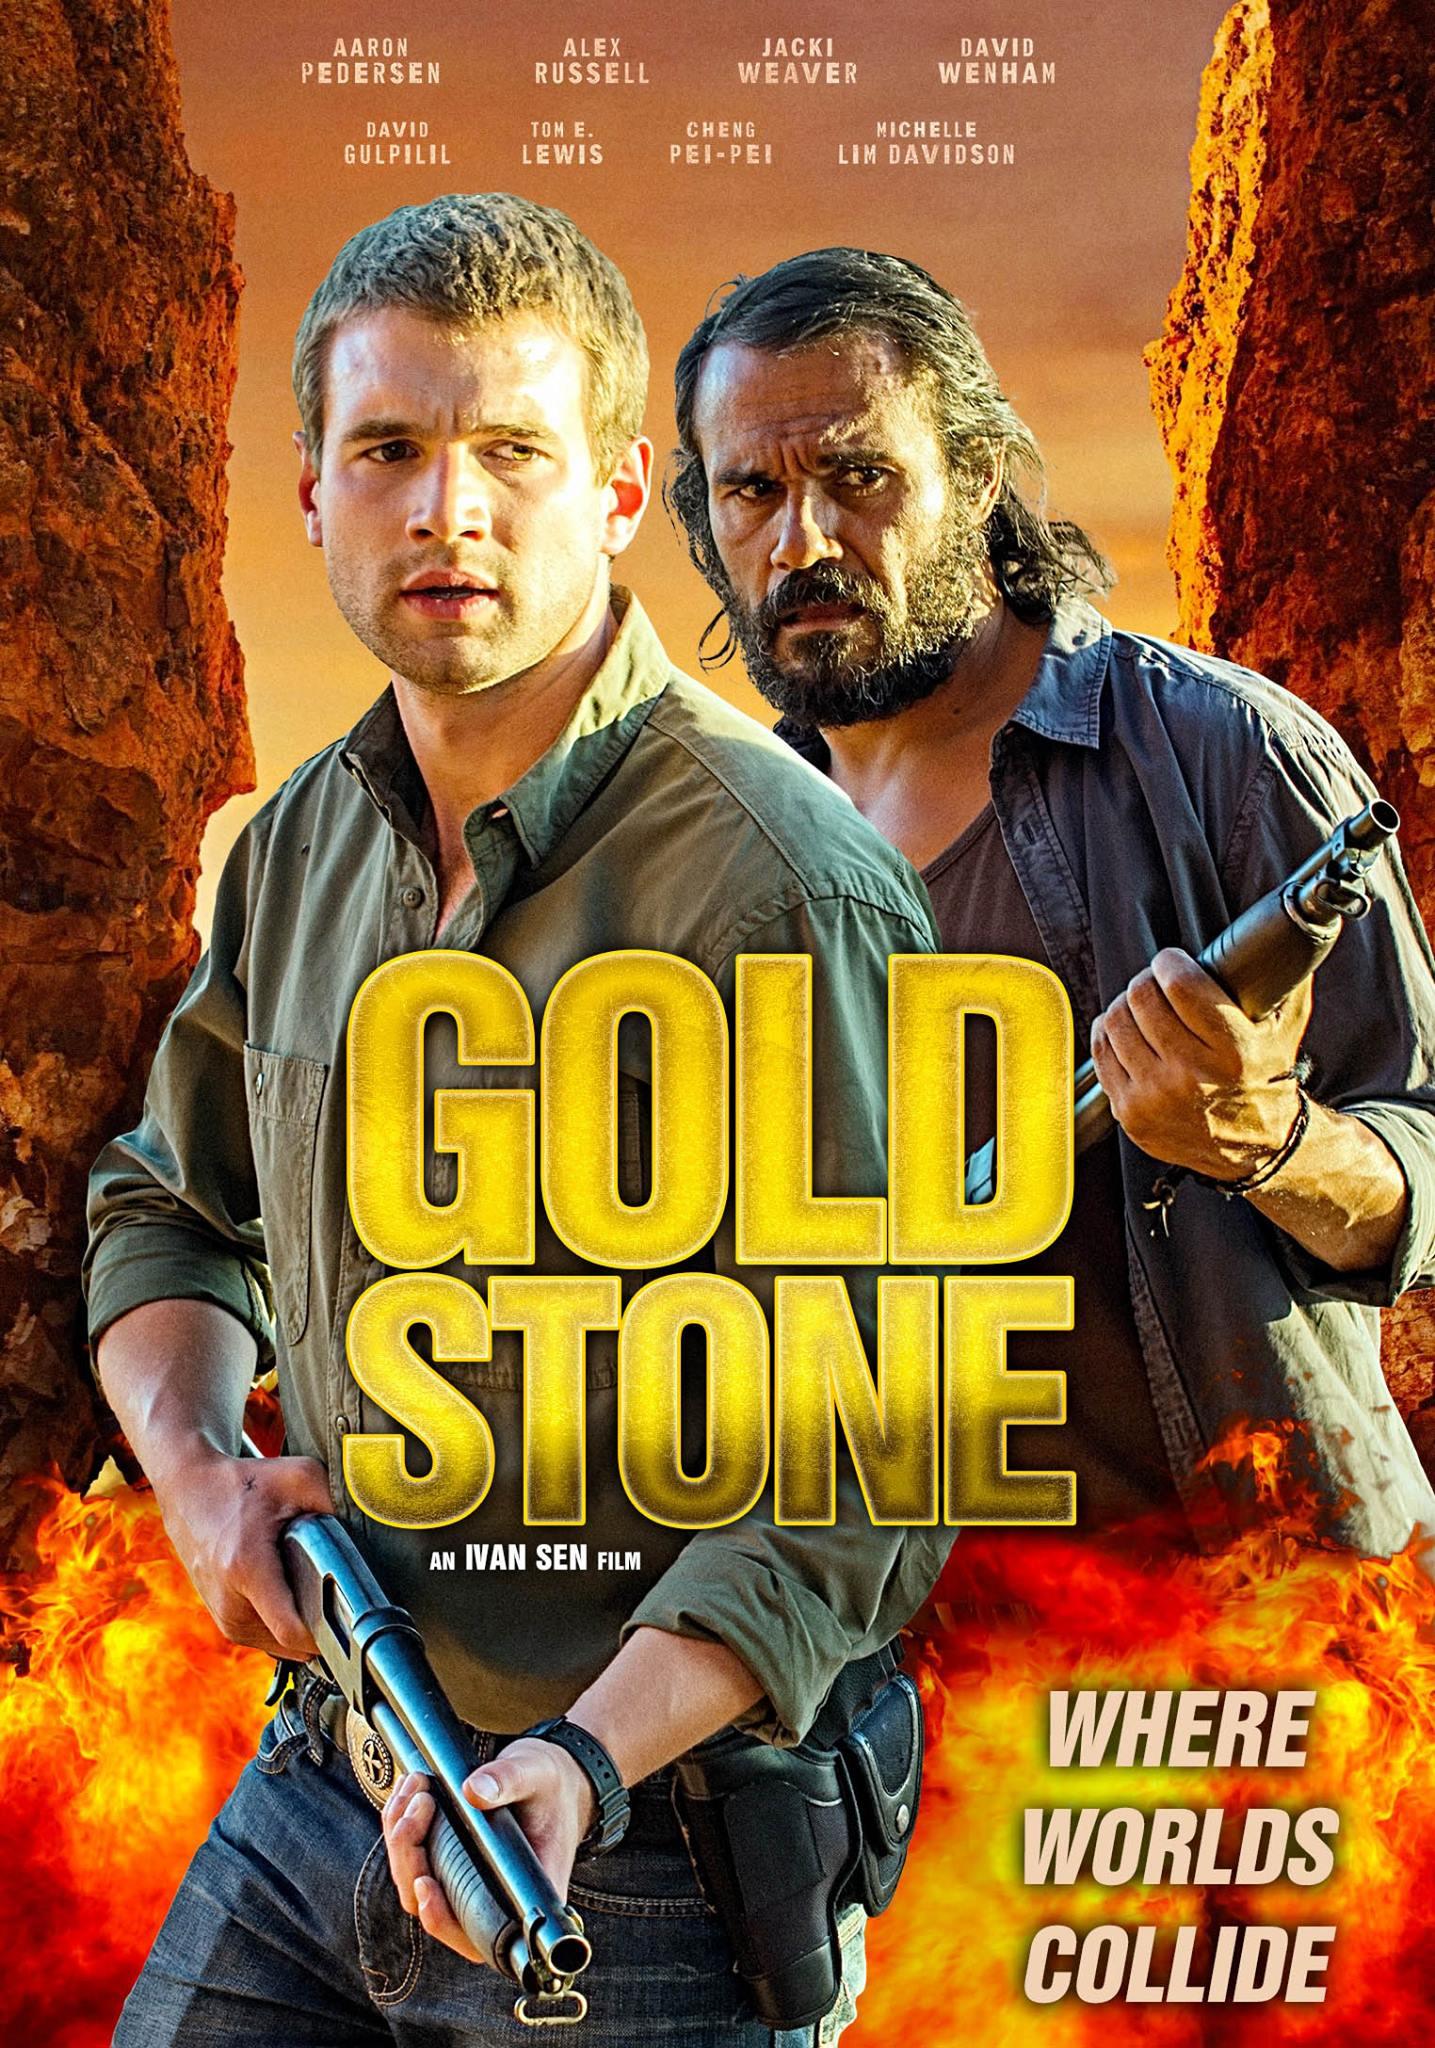 مشاهدة فيلم Goldstone 2016 مترجم اون لاين